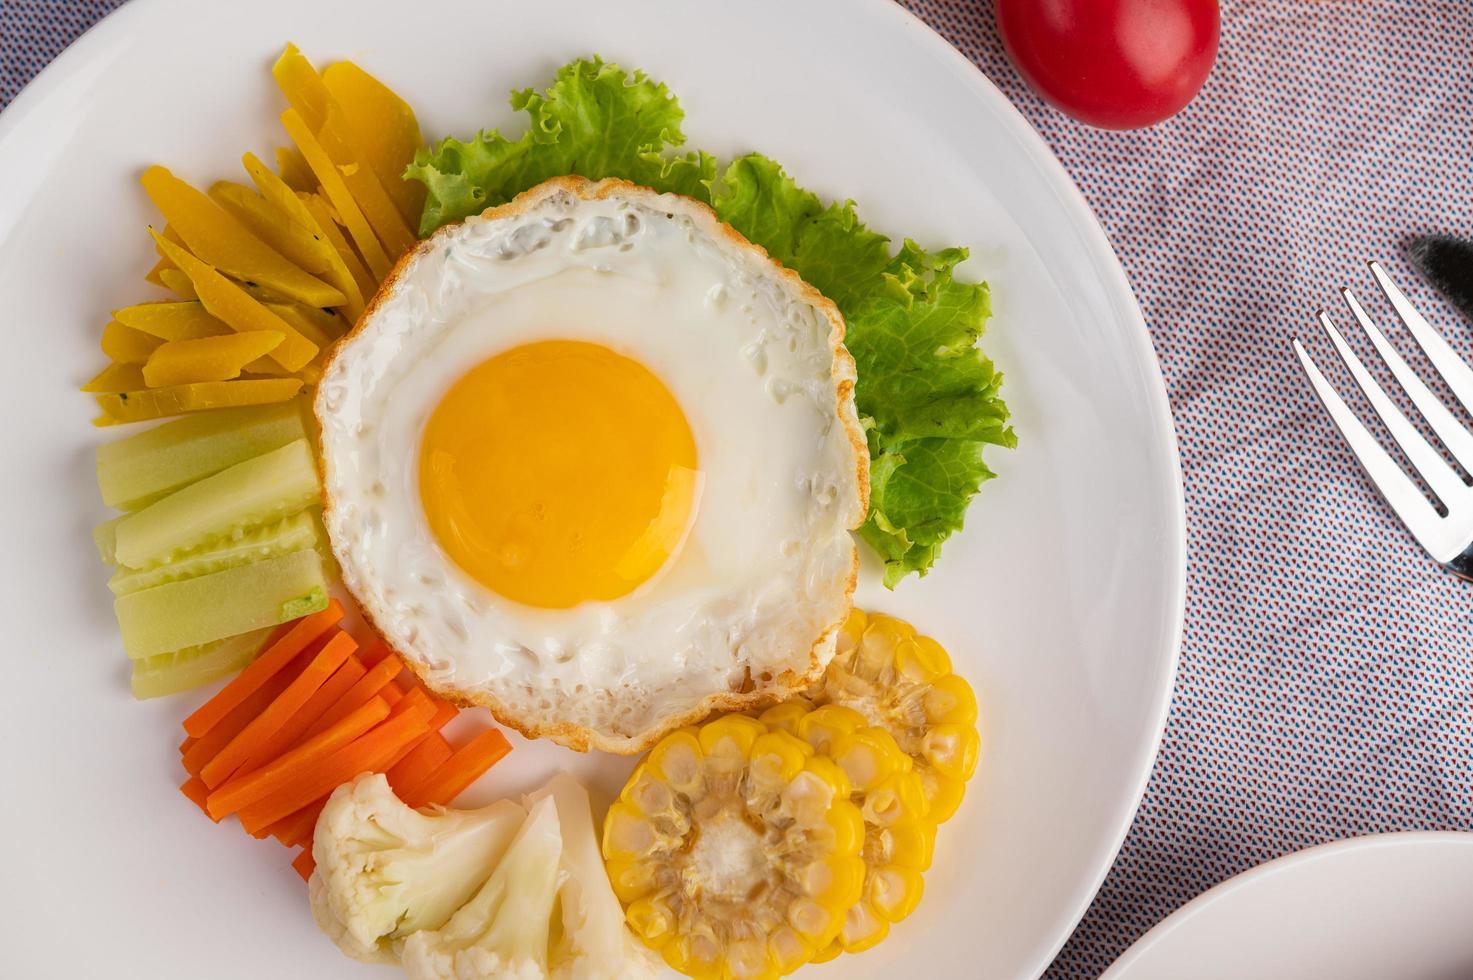 Fried egg, salad, pumpkin, cucumber, carrot, corn, cauliflower, tomato and toast photo